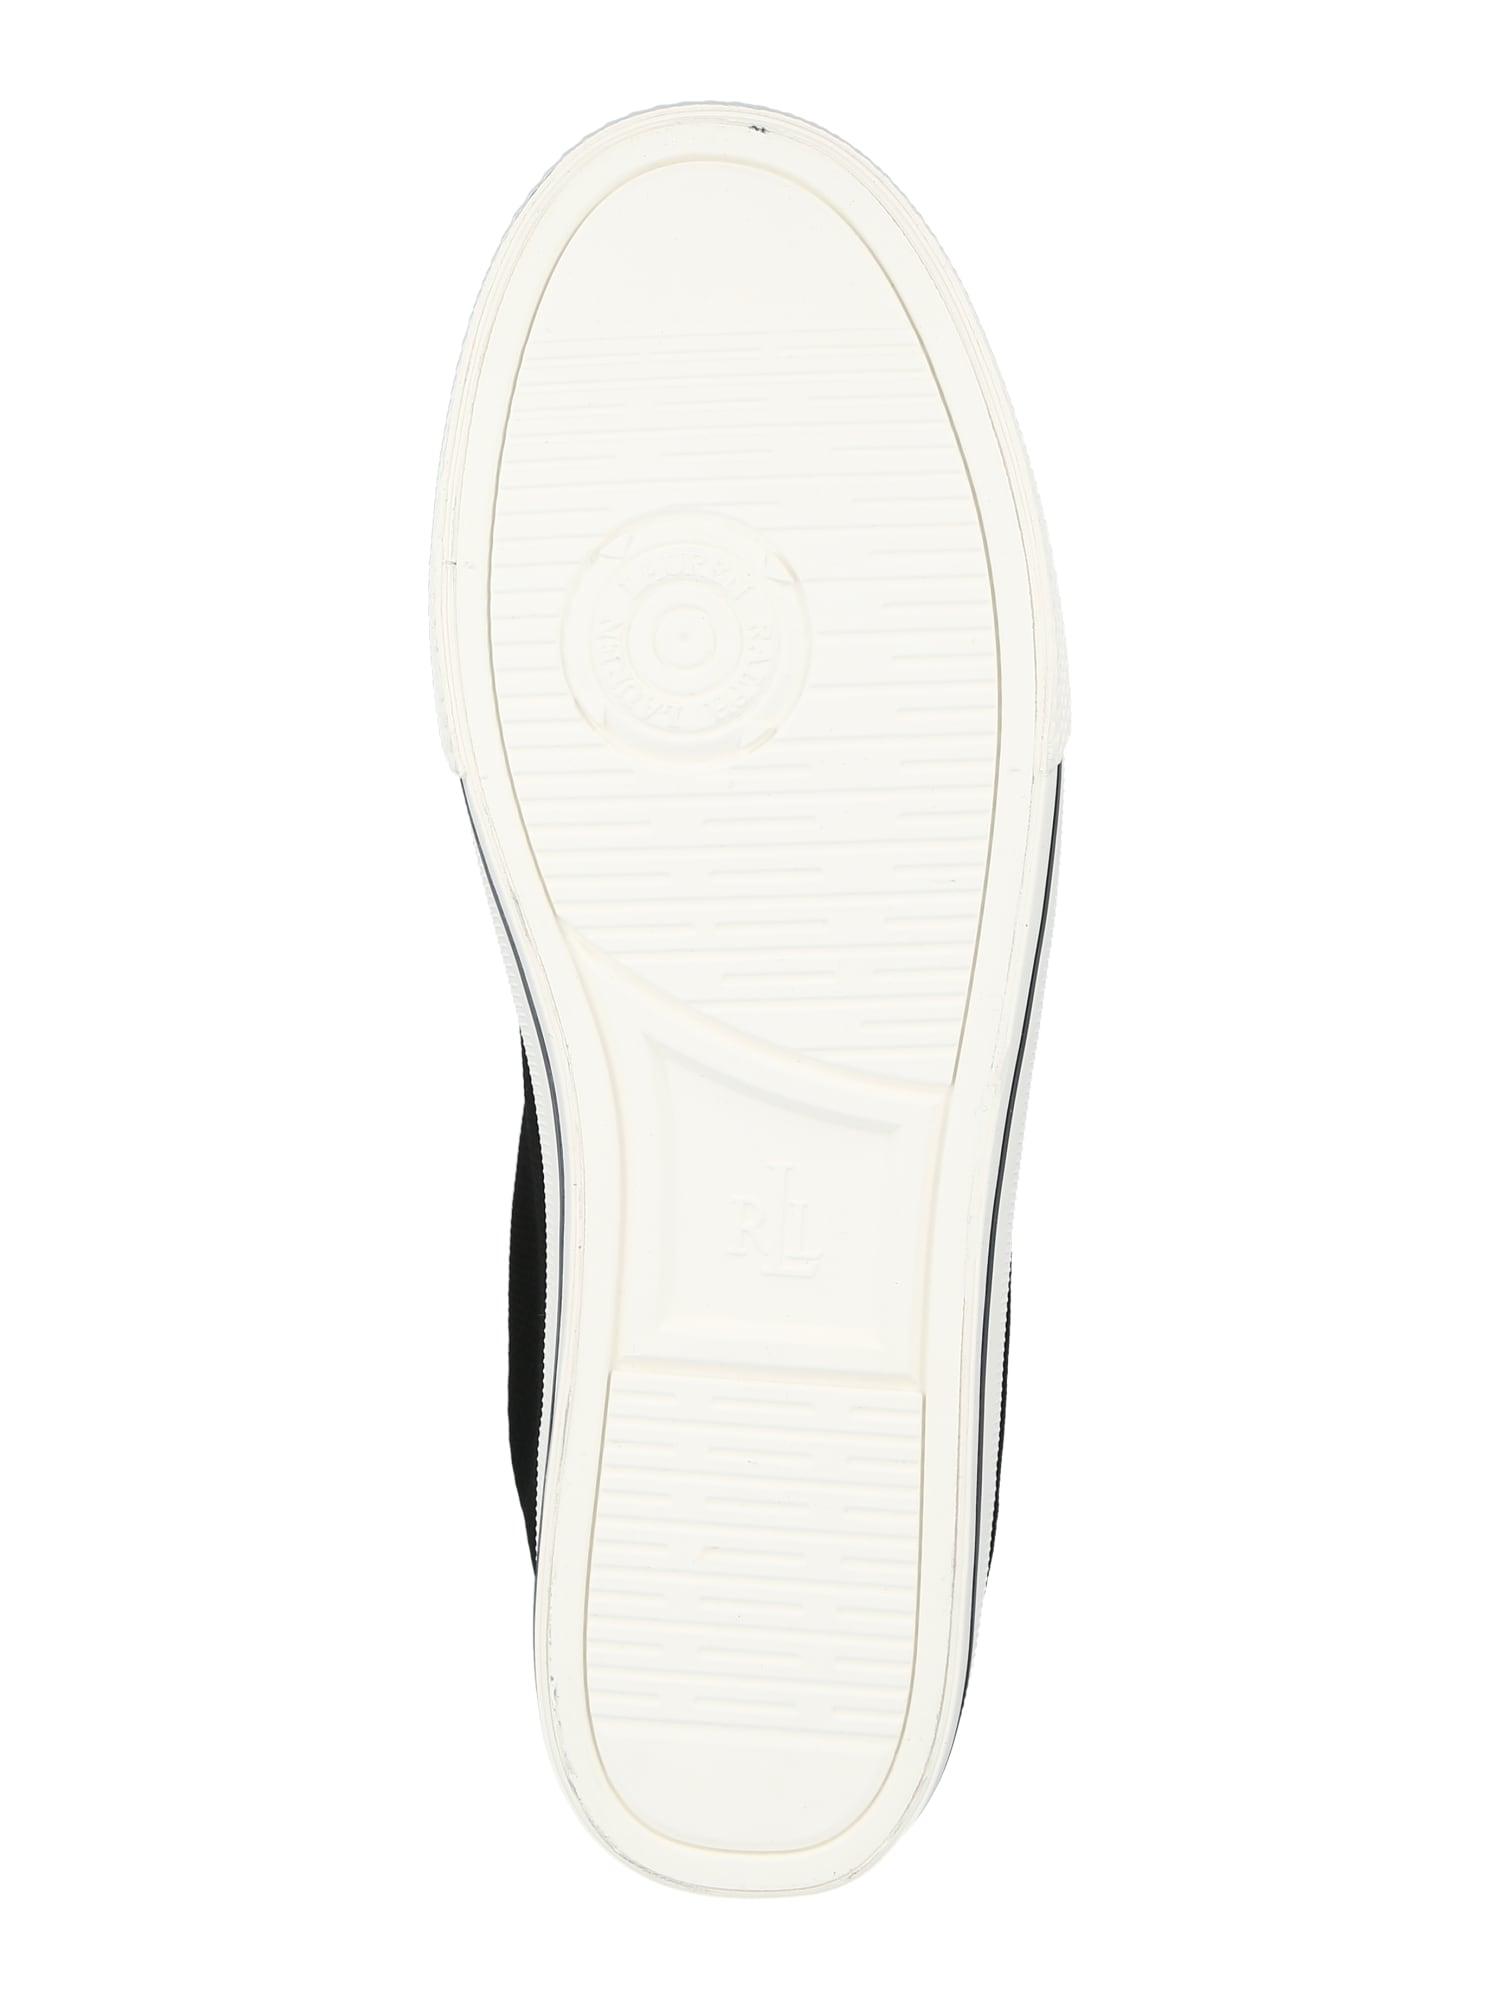 Lauren Ralph Lauren Papuče  čierna / biela dámské 36,5